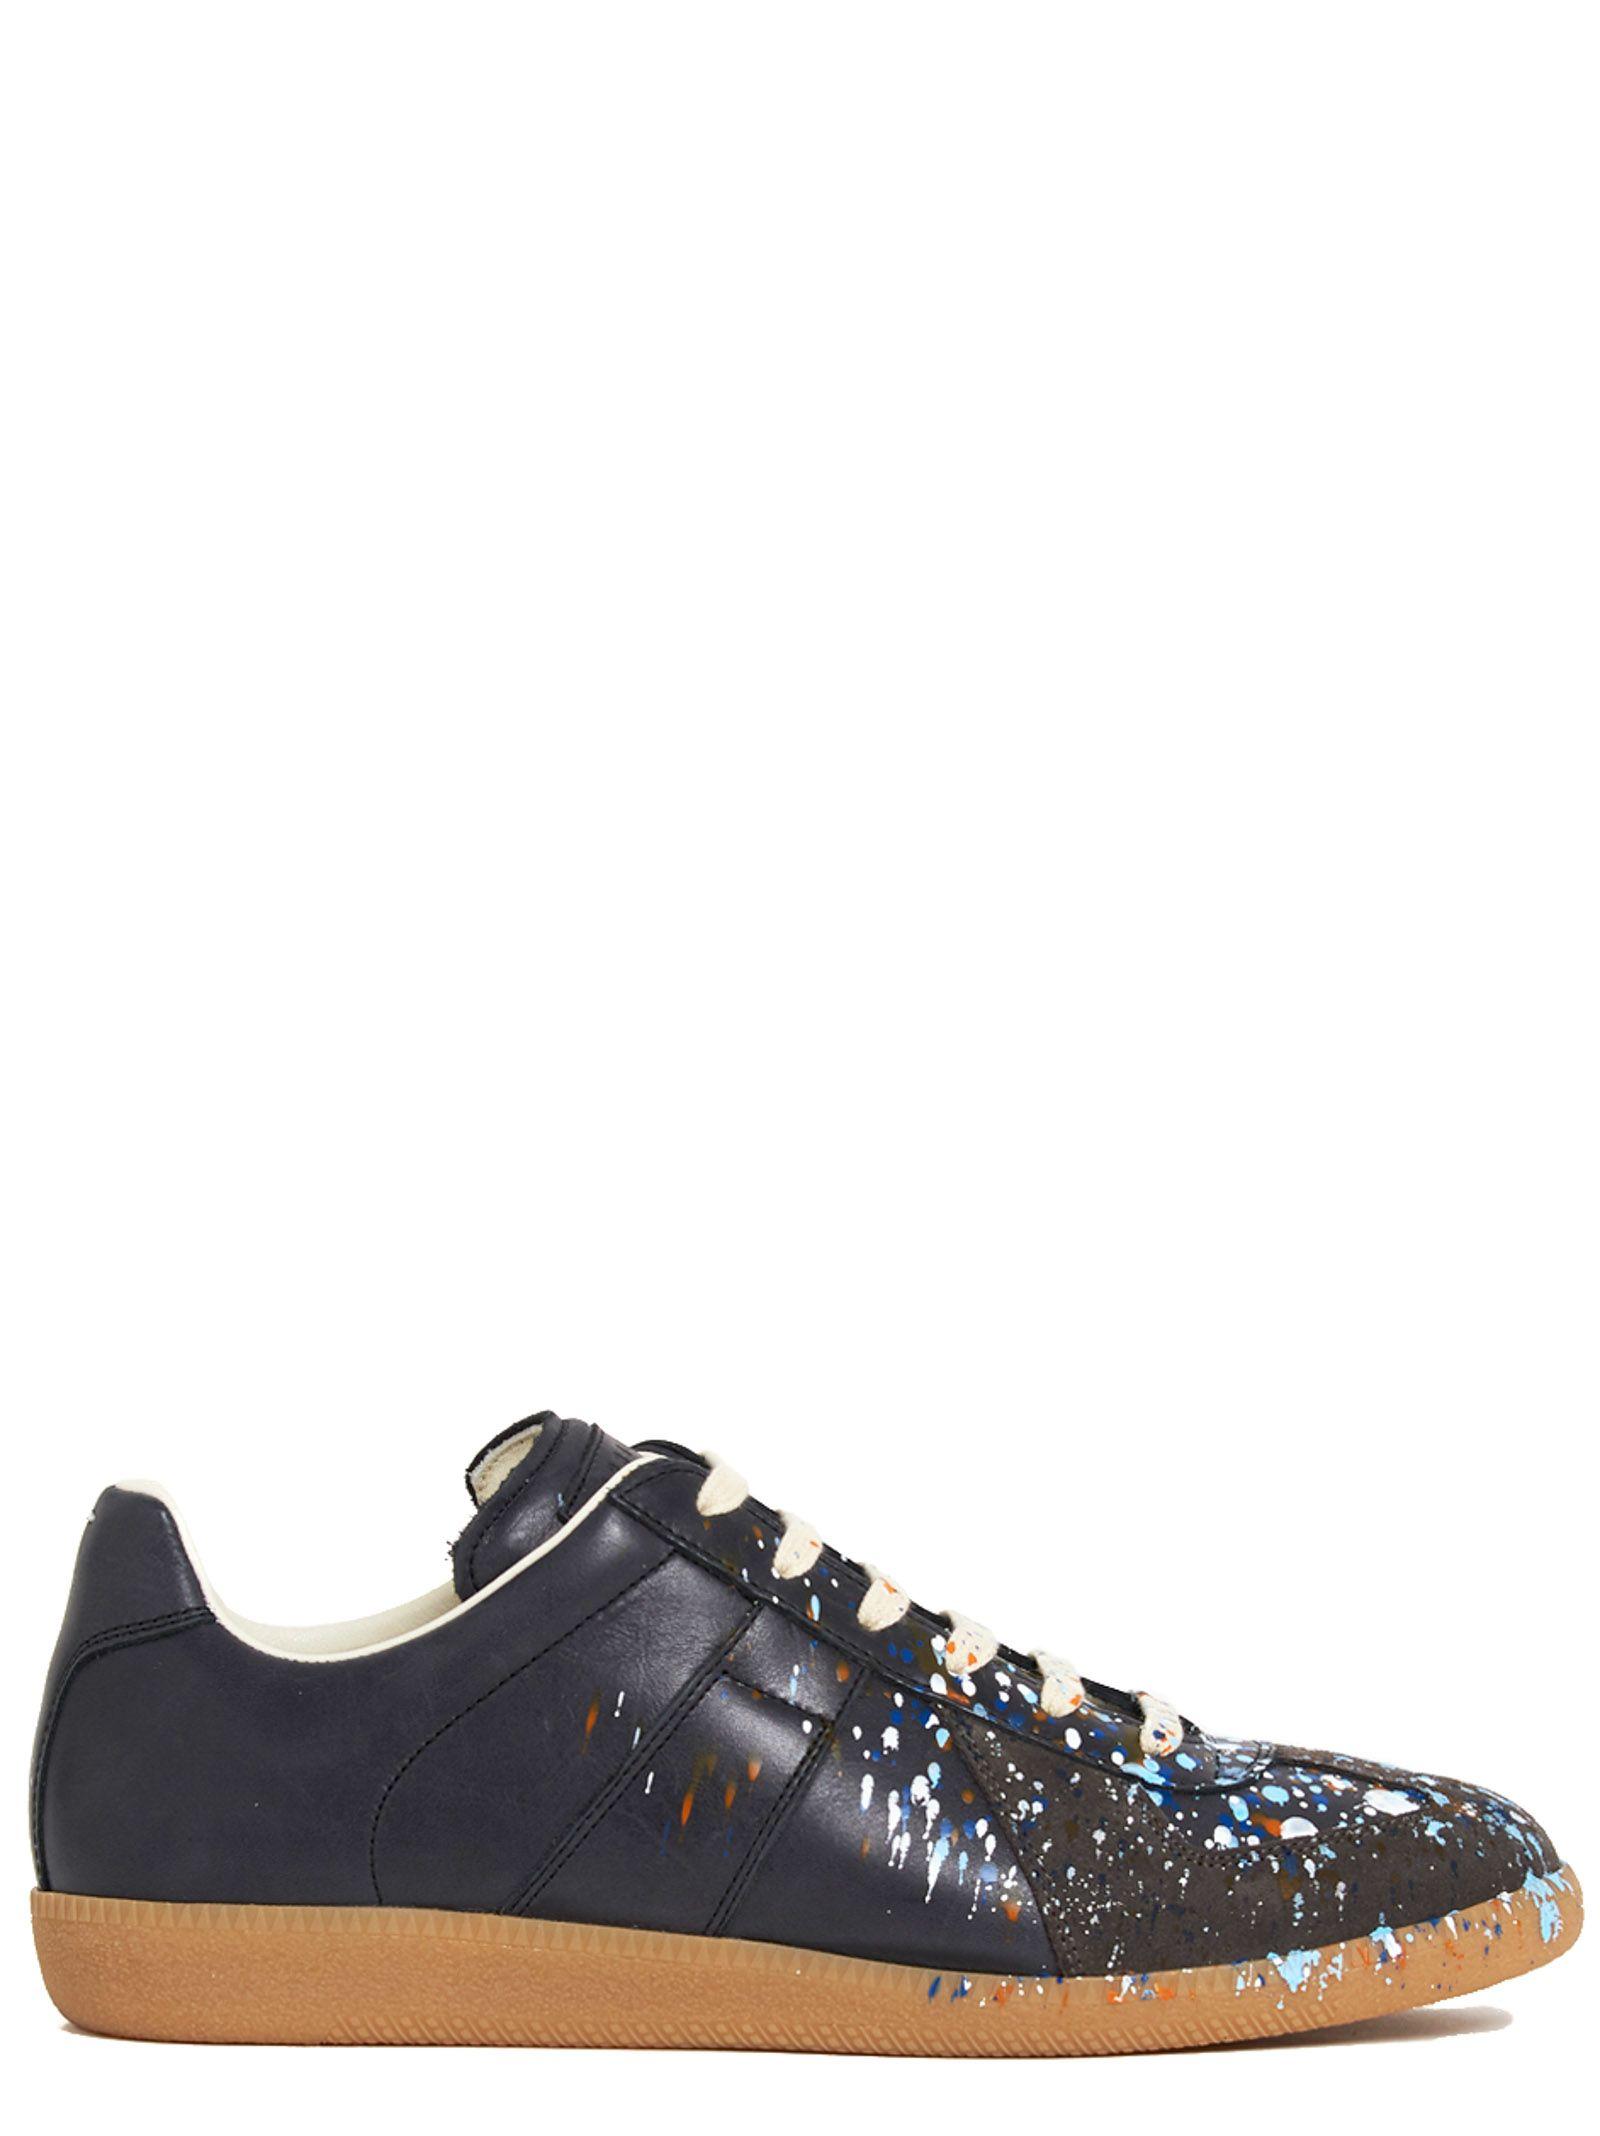 maison margiela maison margiela sneaker black men 39 s sneakers italist. Black Bedroom Furniture Sets. Home Design Ideas